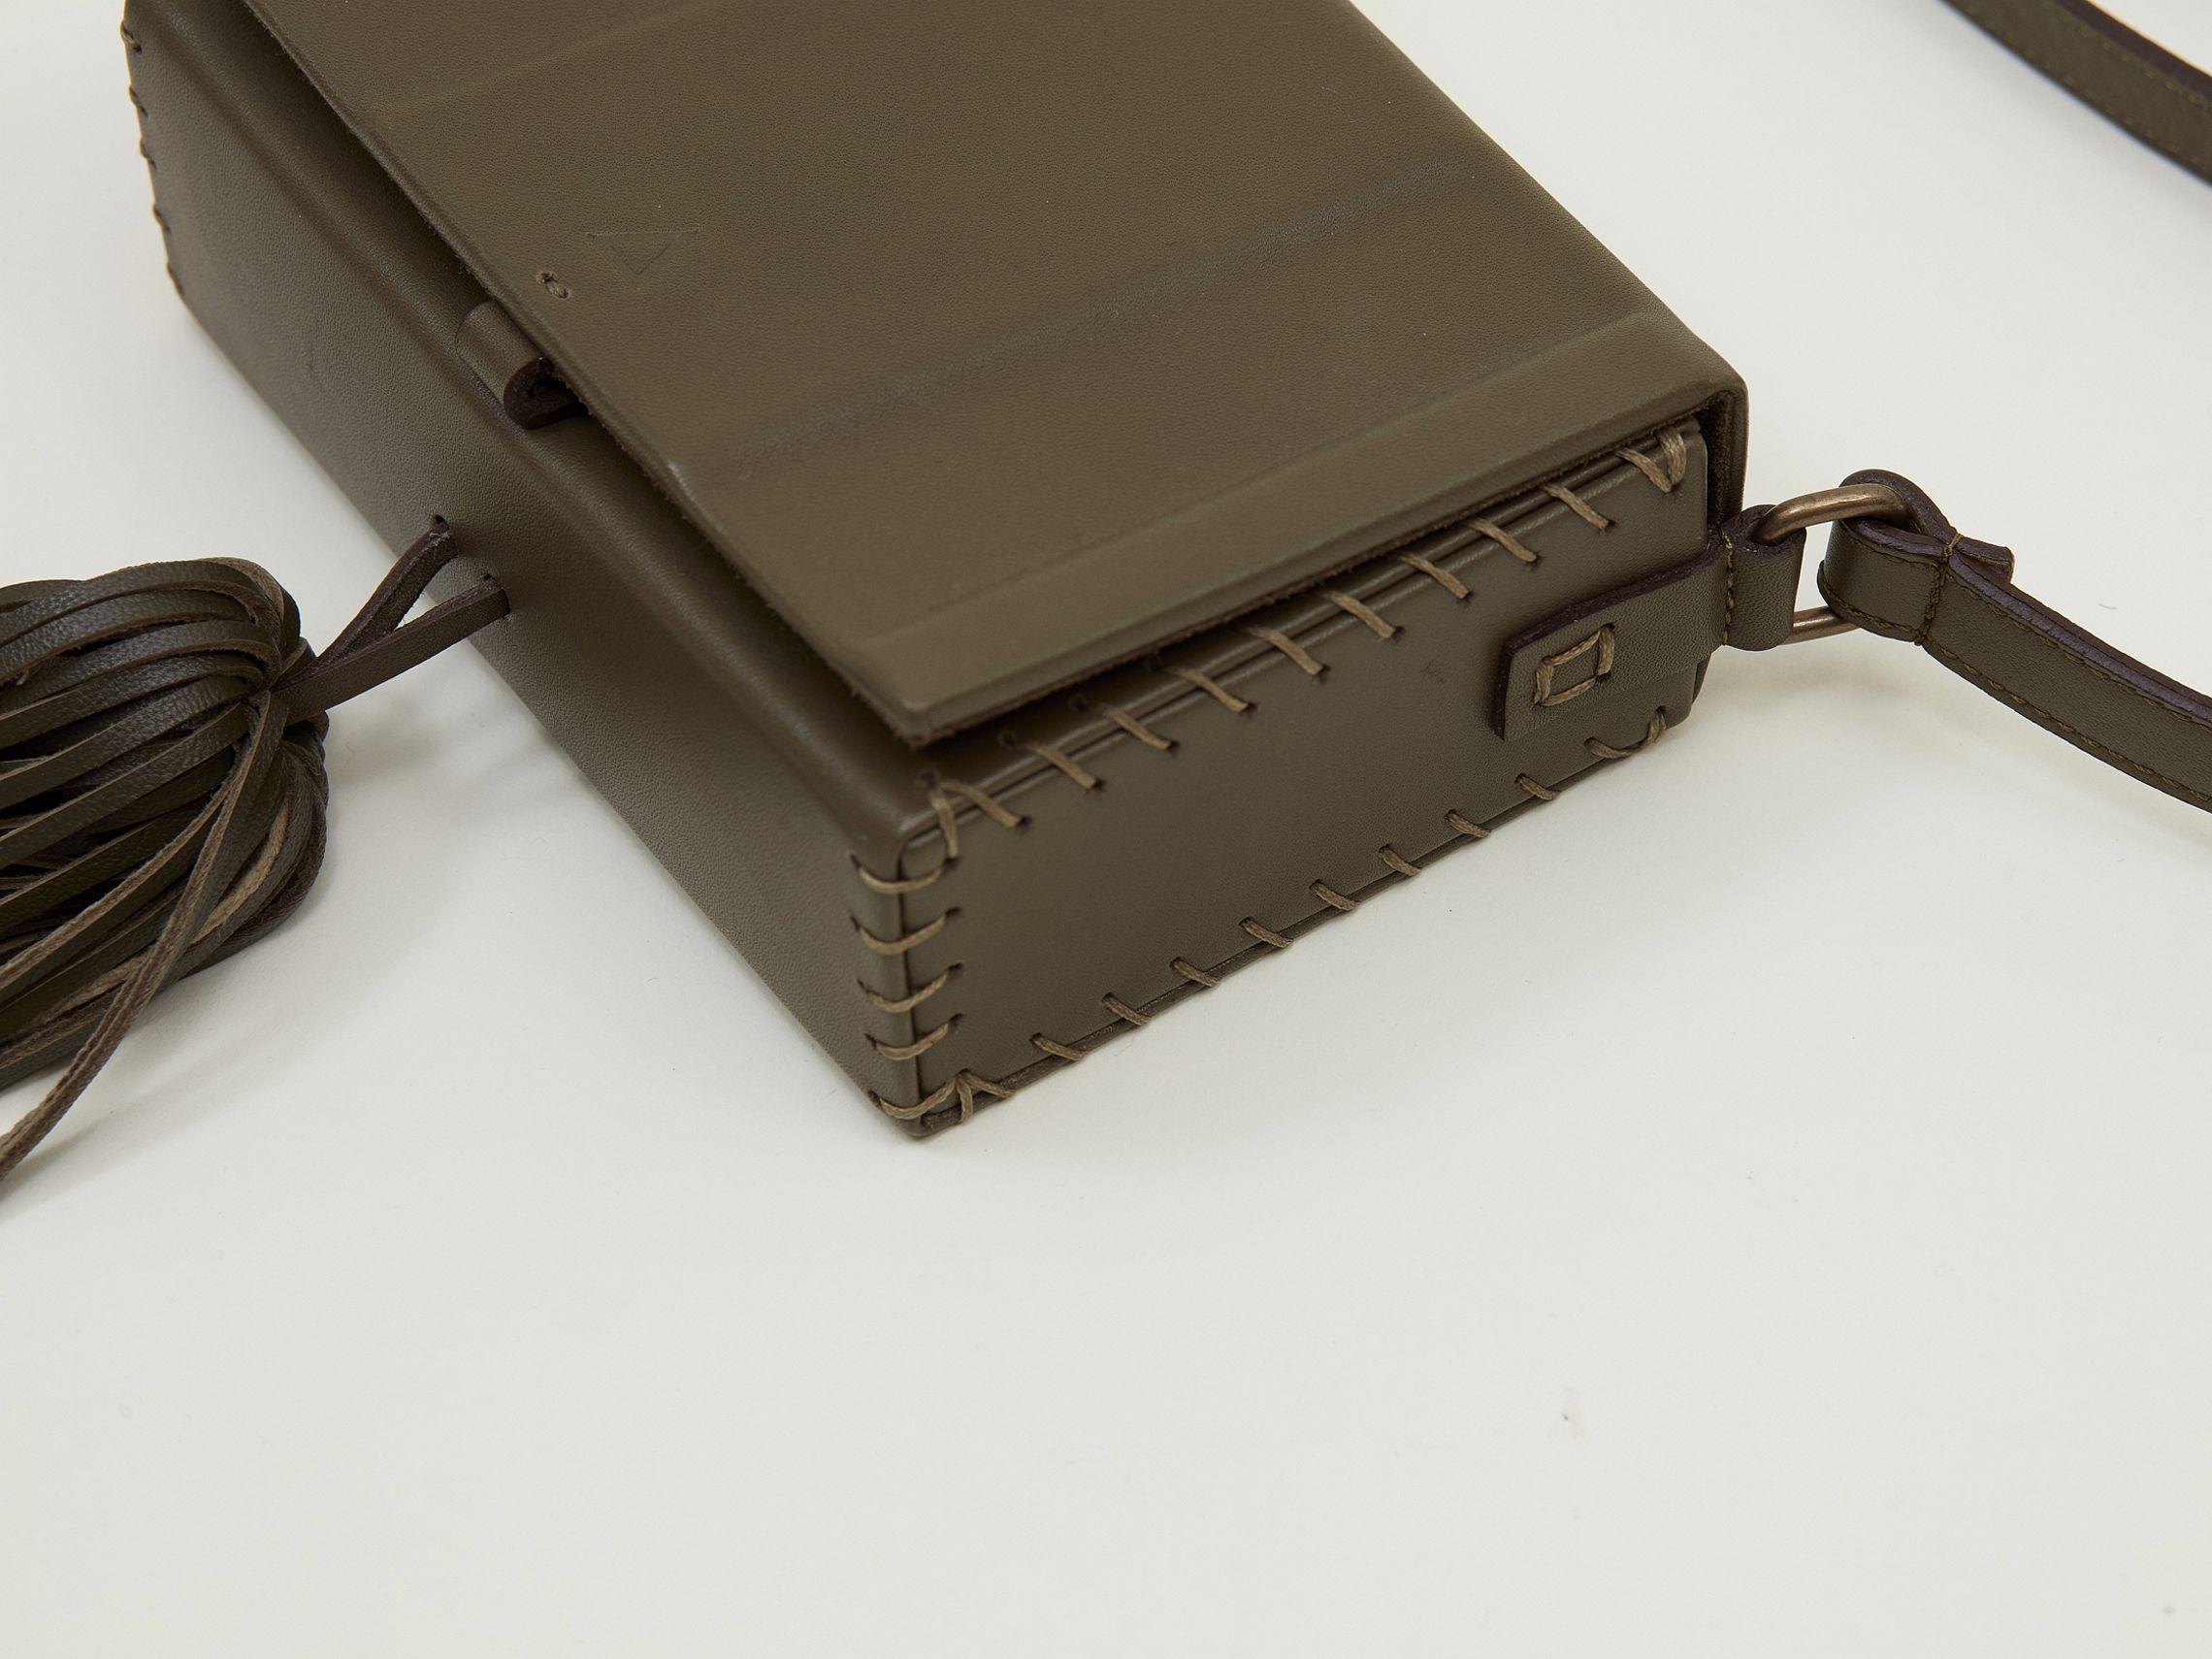 zeus-+-dione-handbag-olive-001-5a15aead51c9a.jpg